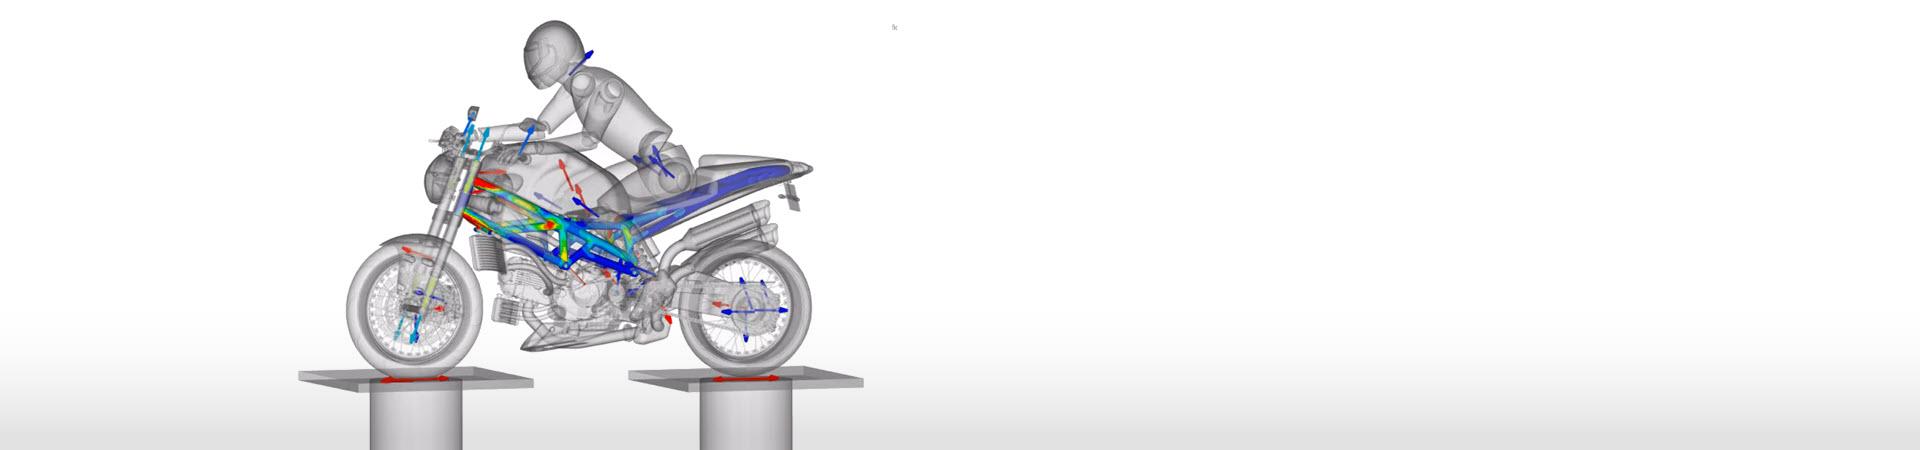 jp-ms-motorcylce